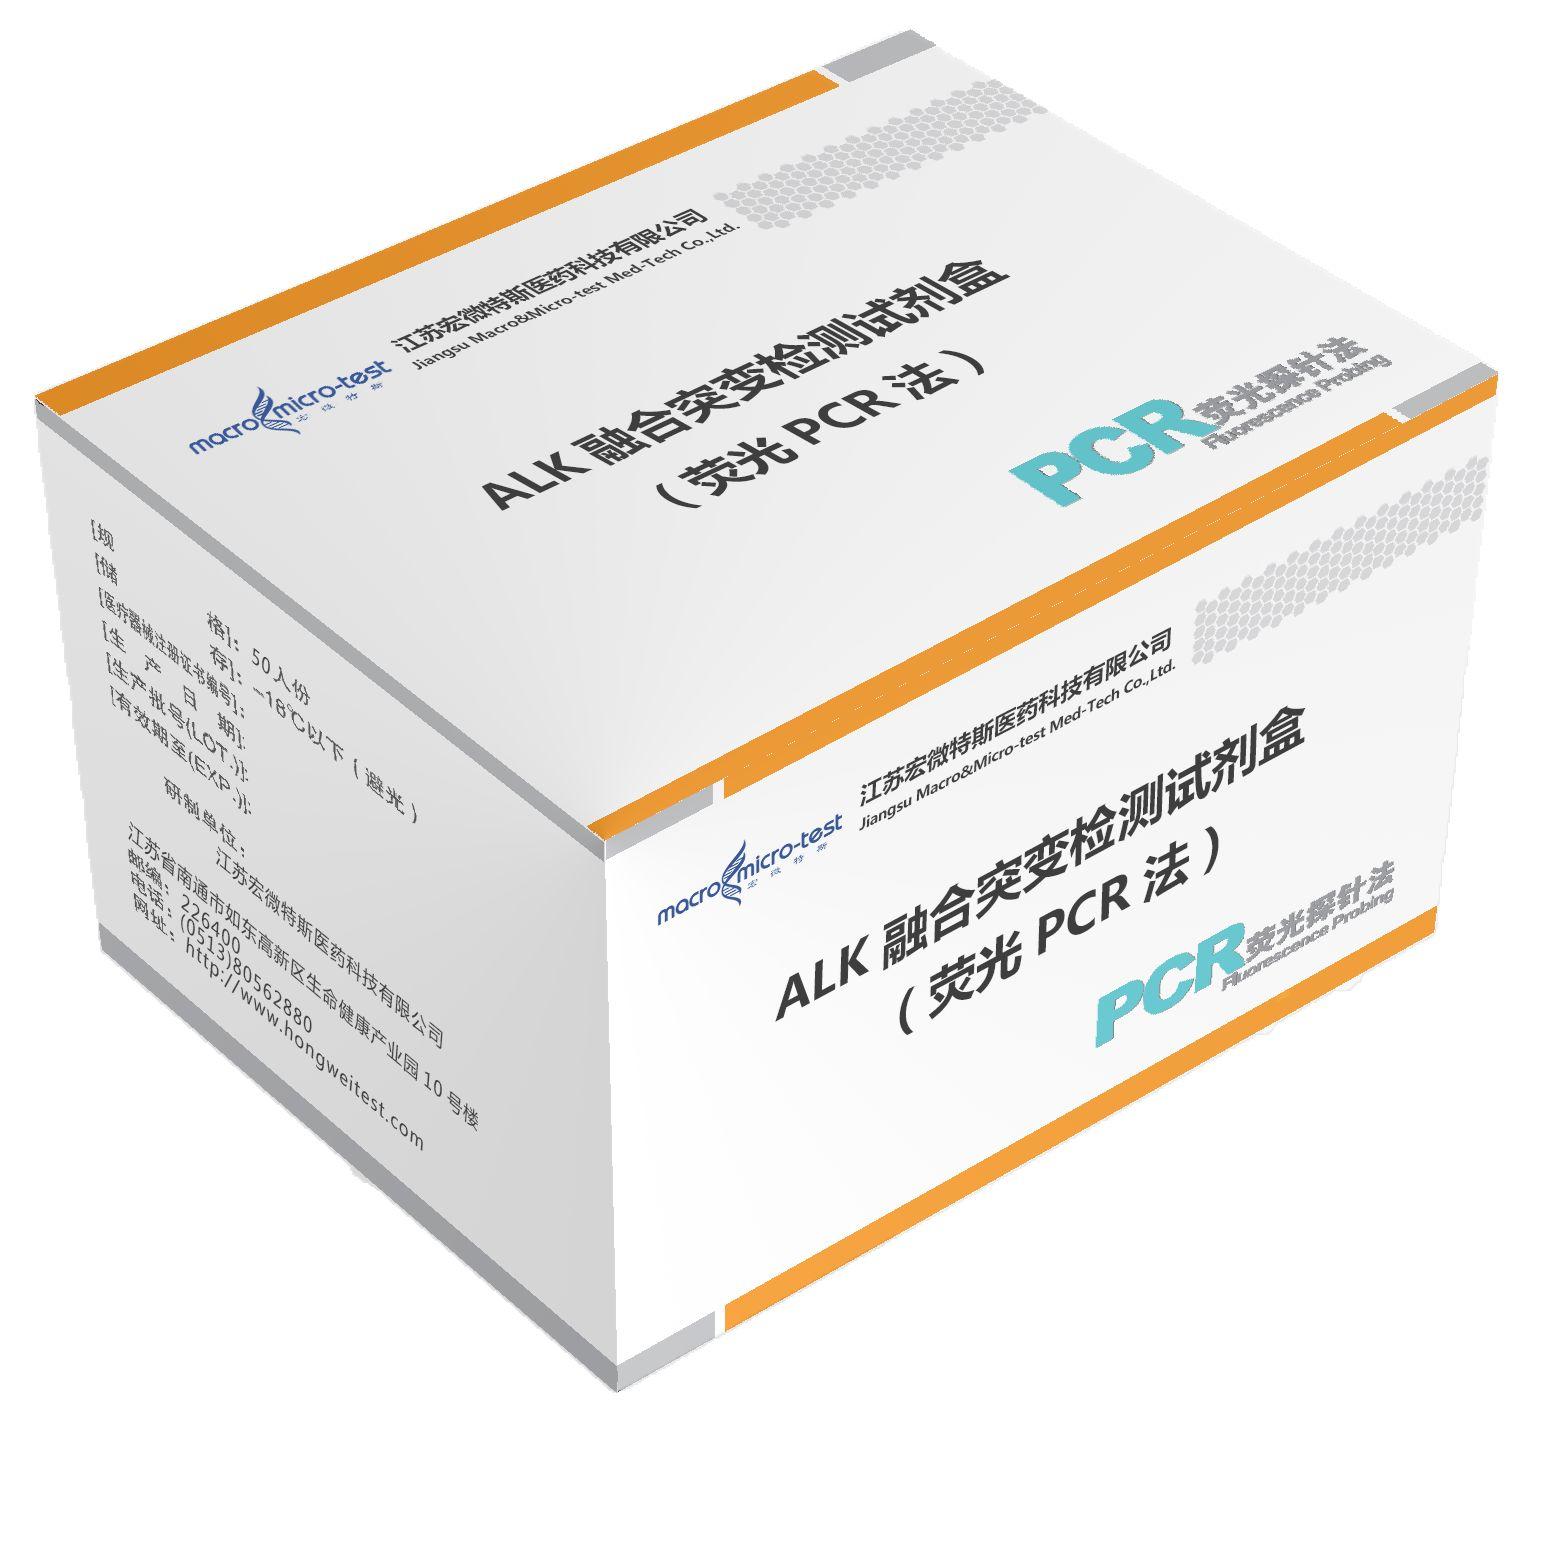 ALK融合突变检测试剂盒(荧光PCR法)